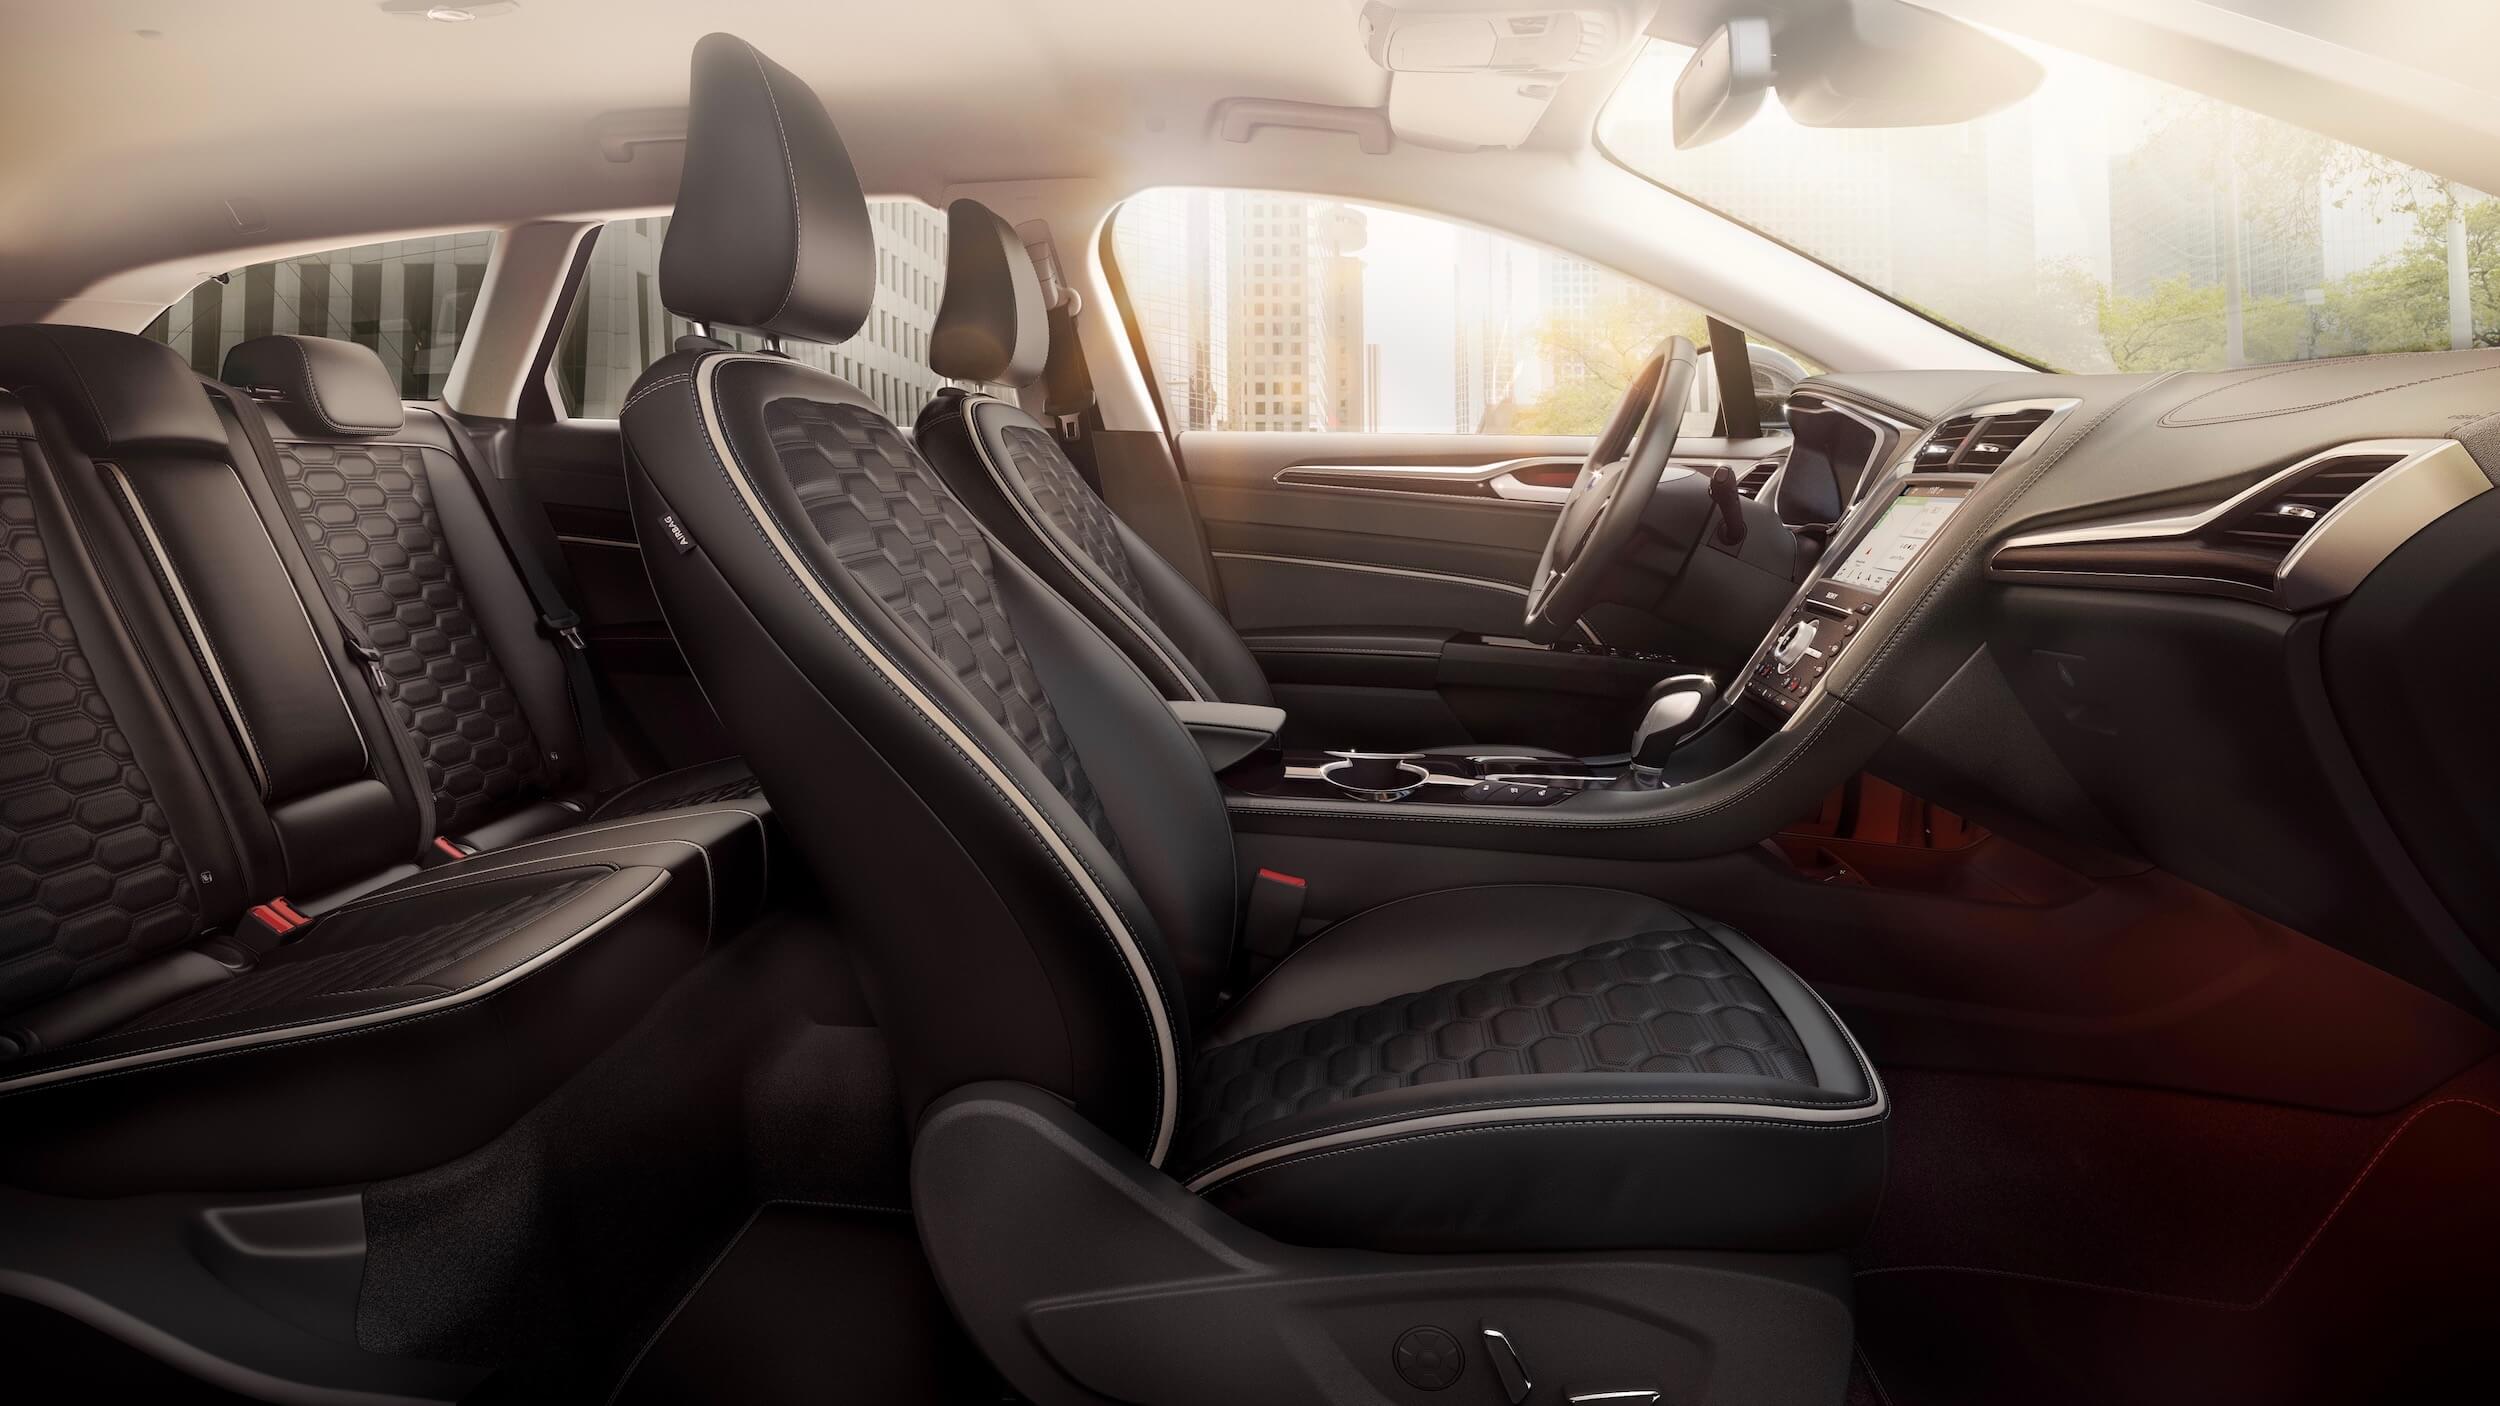 Hybride Ford Mondeo zetels